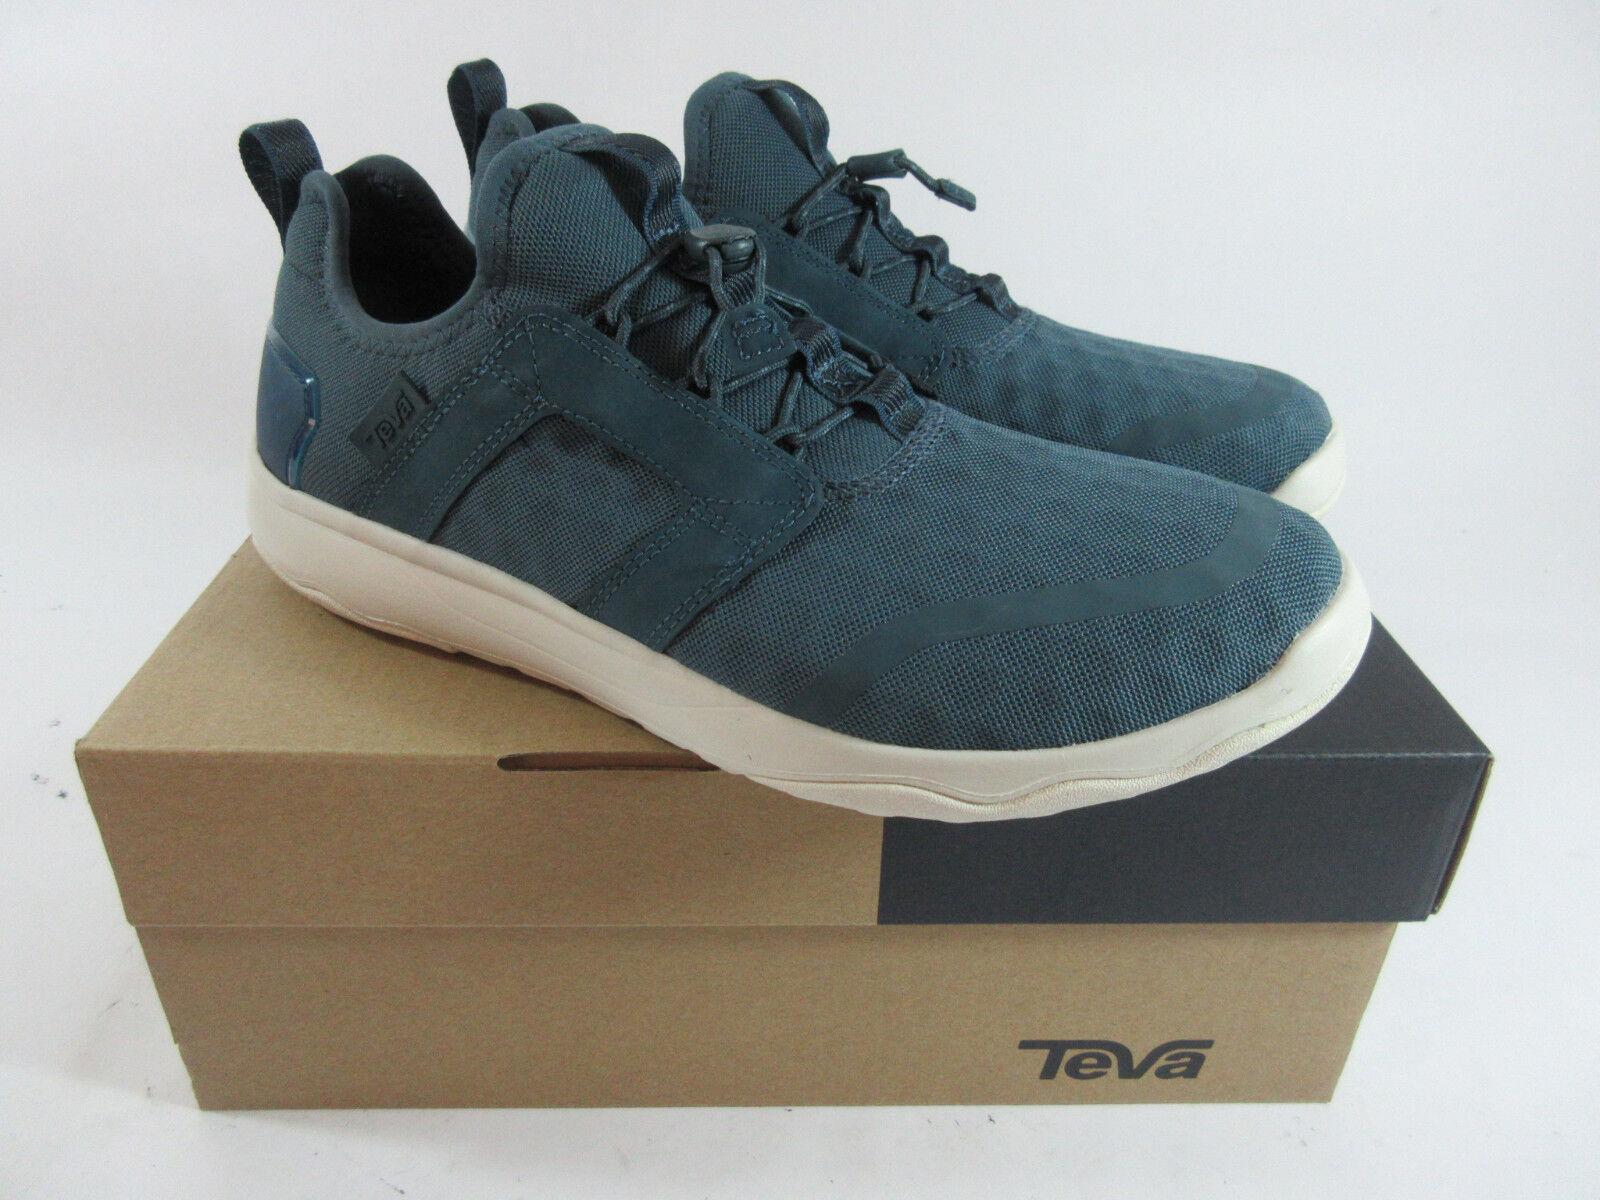 Teva Arrowood Swift Teal bluee Indigo Womens Lace Sneakers Size 8.5 NEW